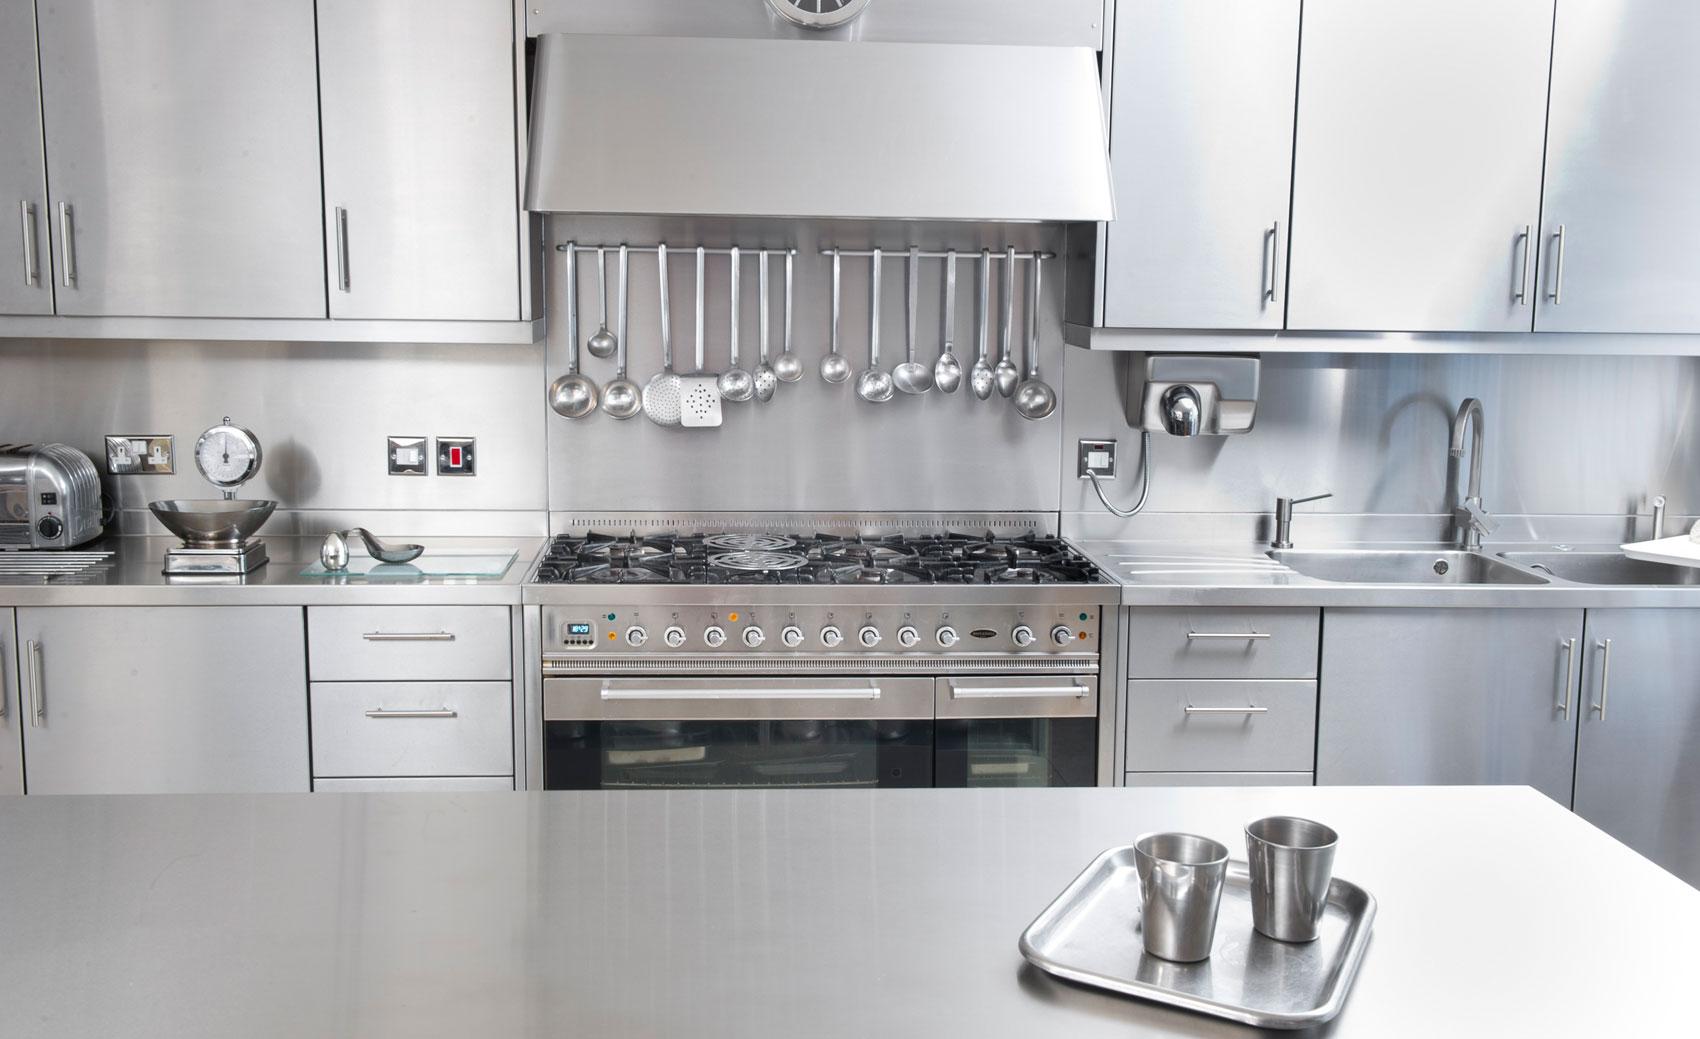 Stainless Steel Kitchen Cabinet Worktops Splash Backs Uk Cavendish Equipment